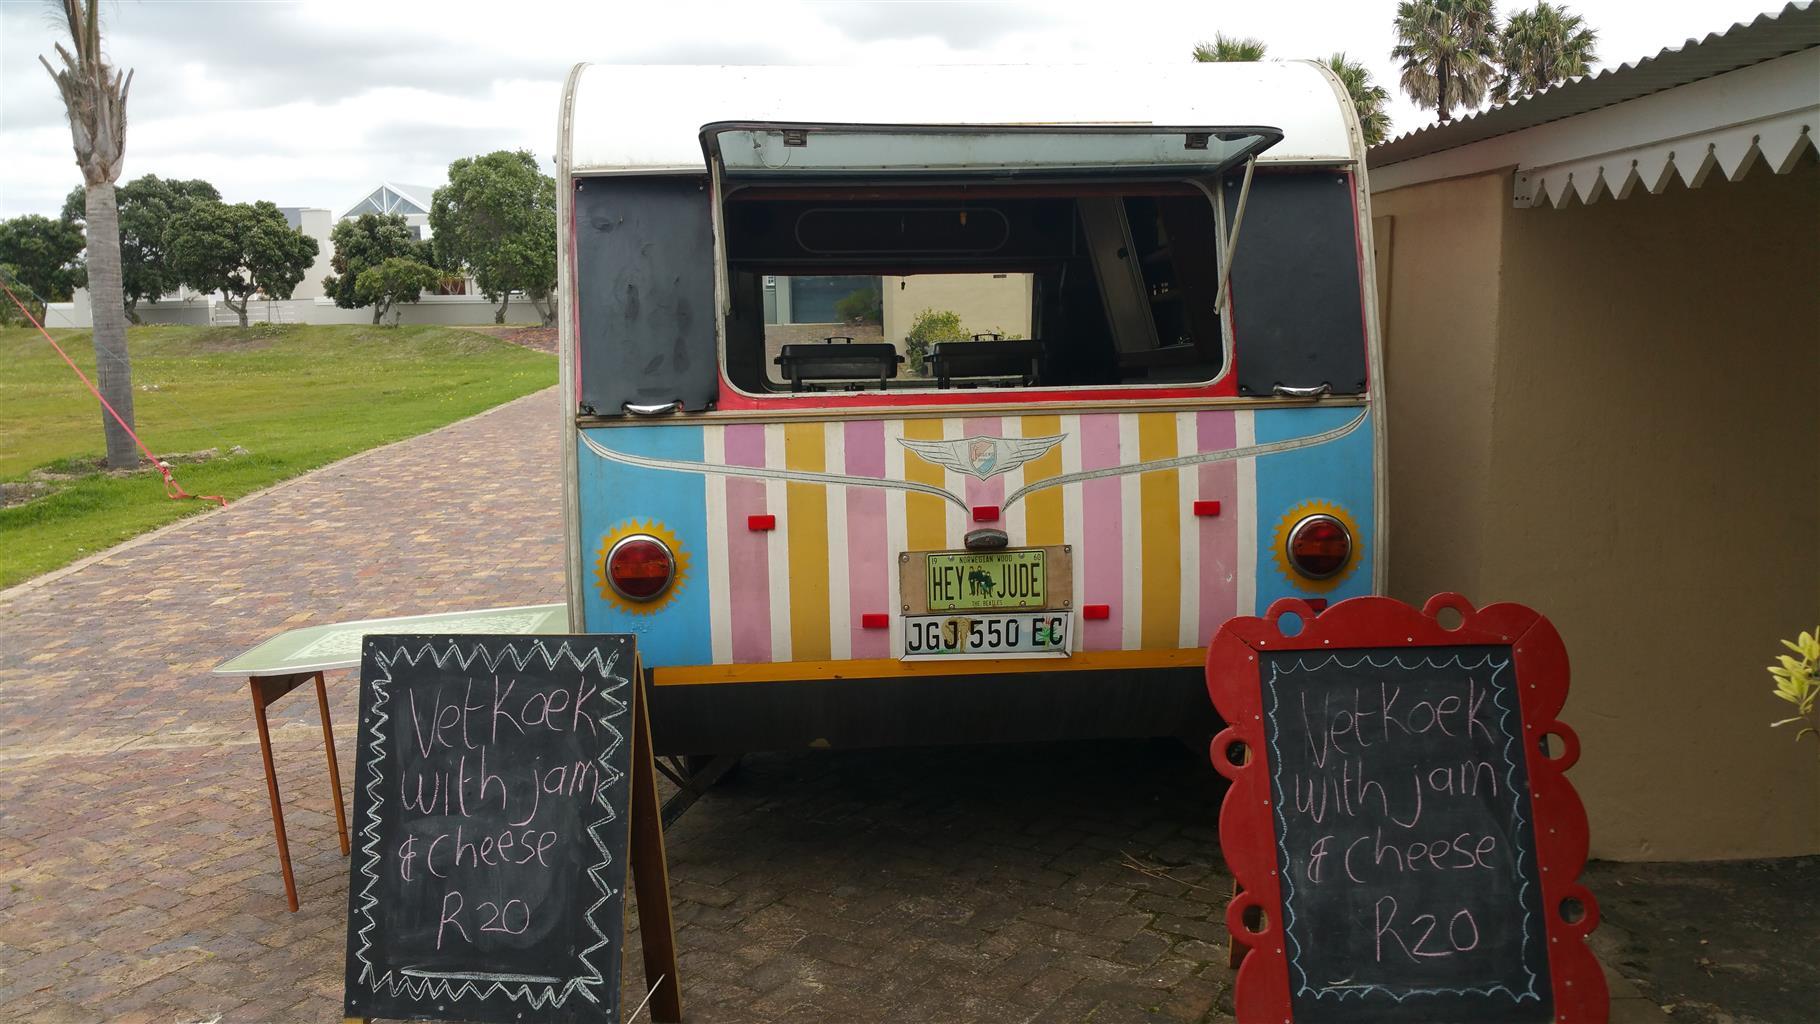 Catering caravan or food trailer